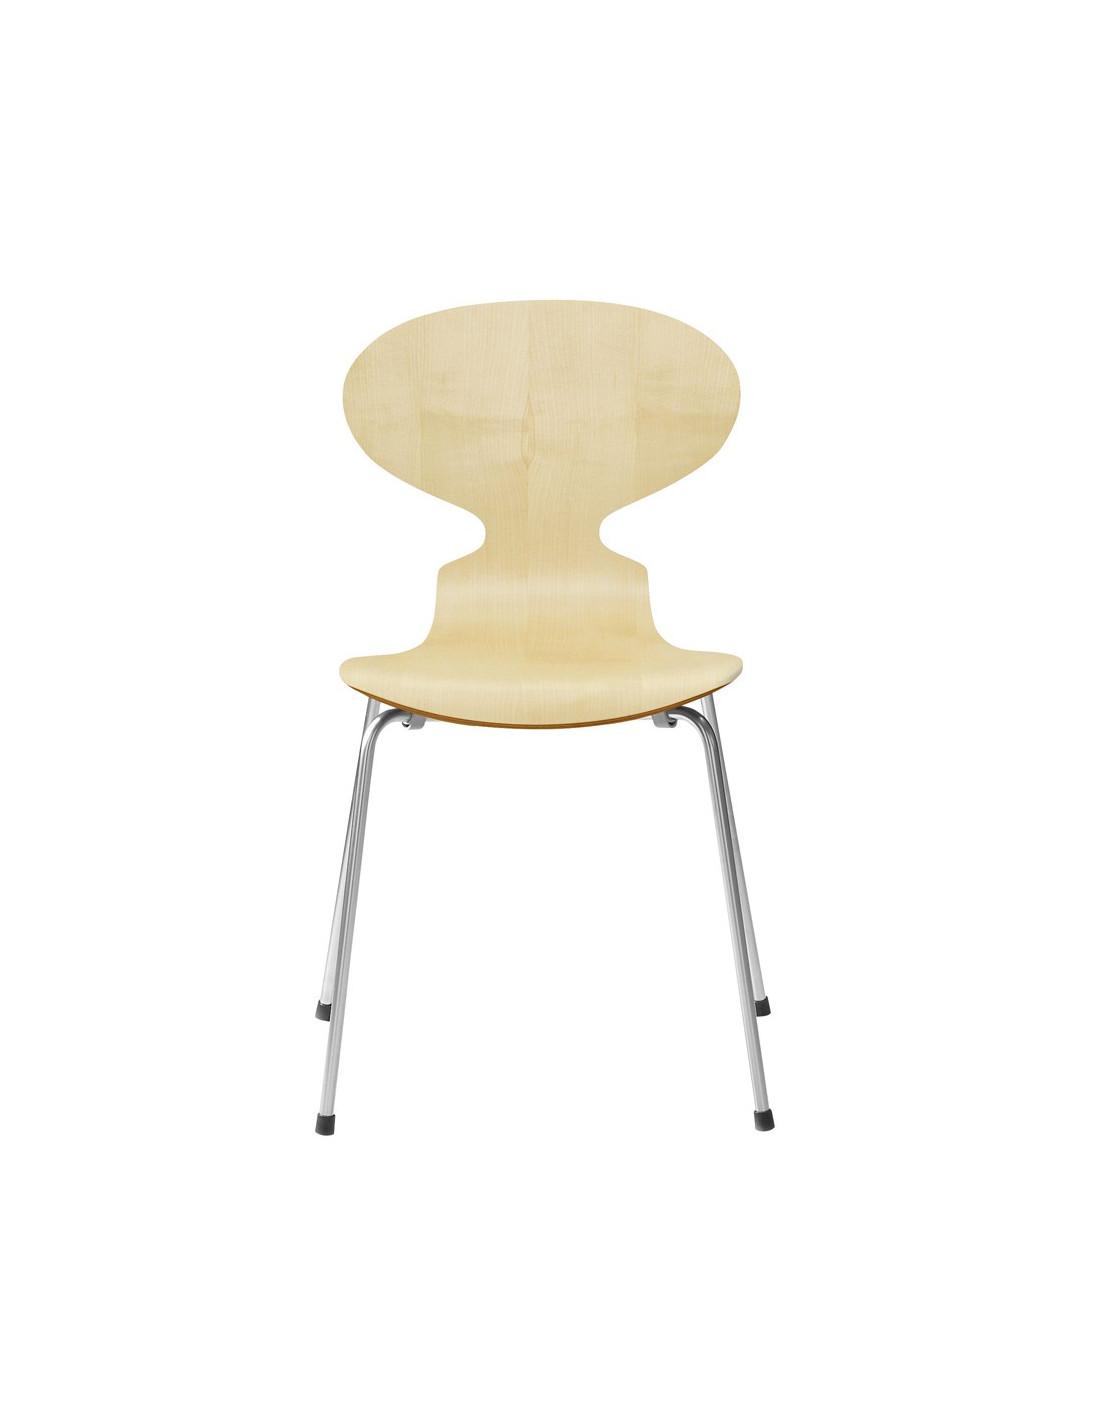 Chaise fourmi design arne jacobsen pour fritz hansen la boutique danoise - Chaise danoise design ...